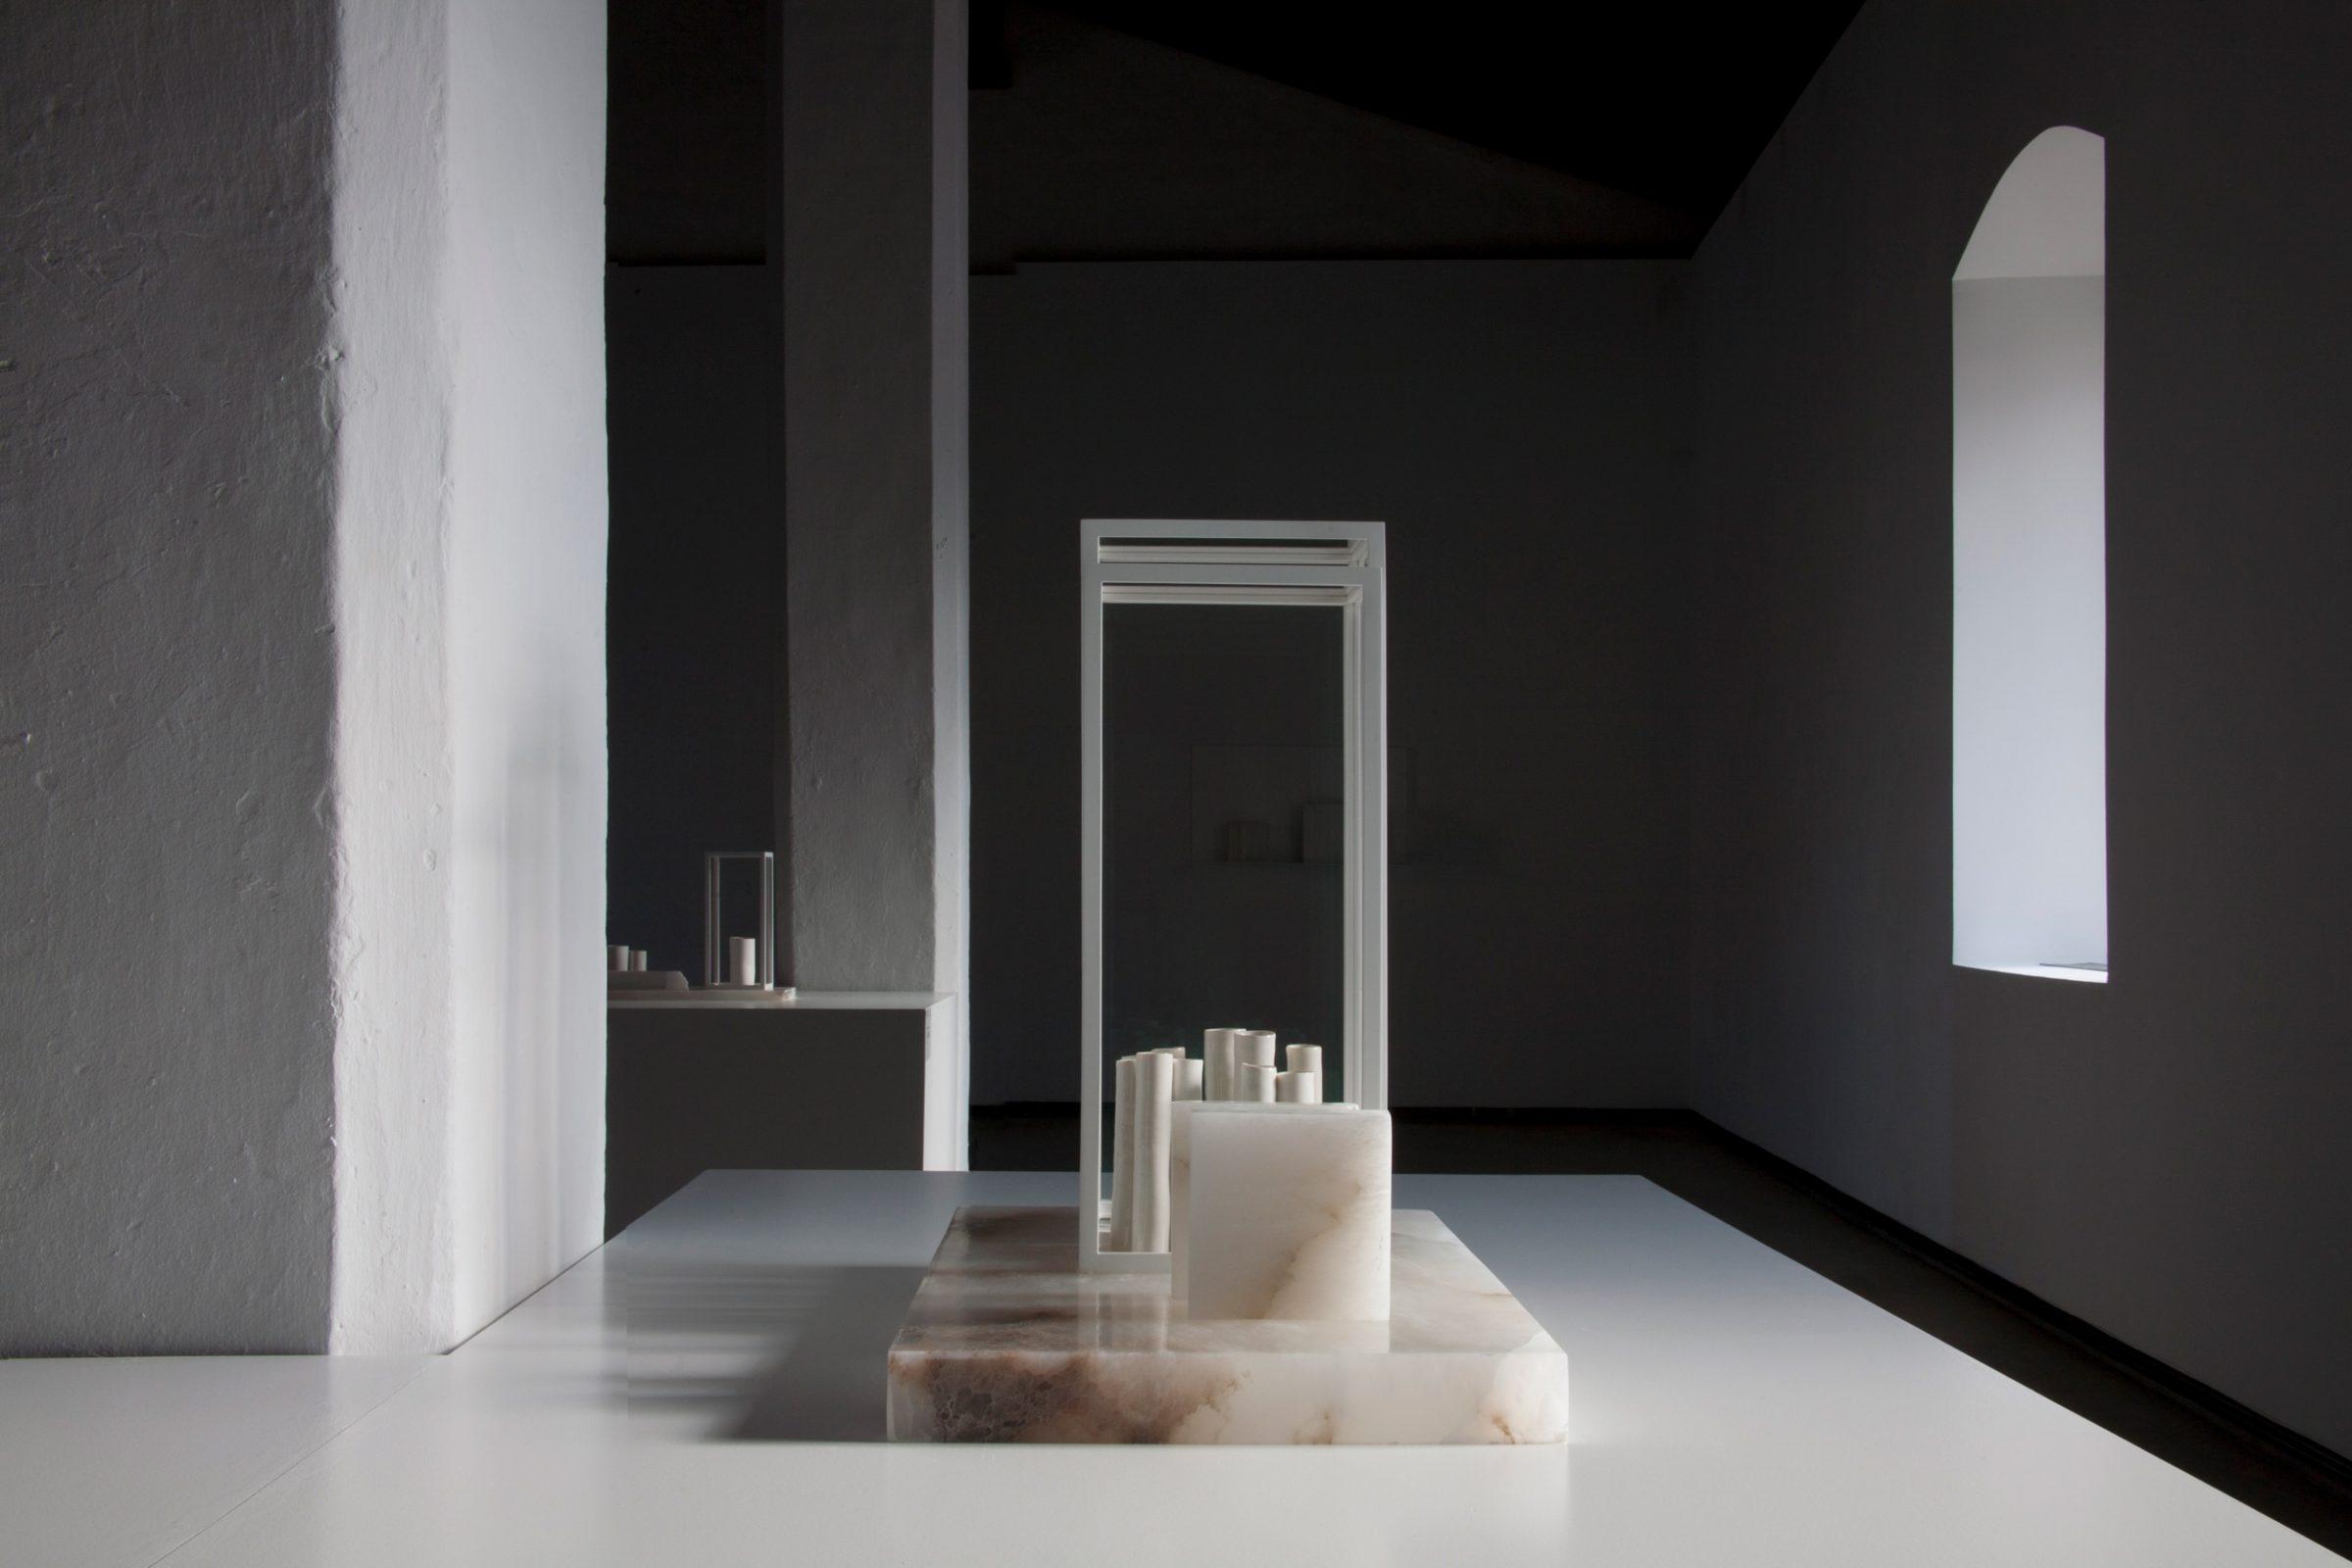 Edmund De Waal White Island Museo De Arte Contemporaneo De Ibiza